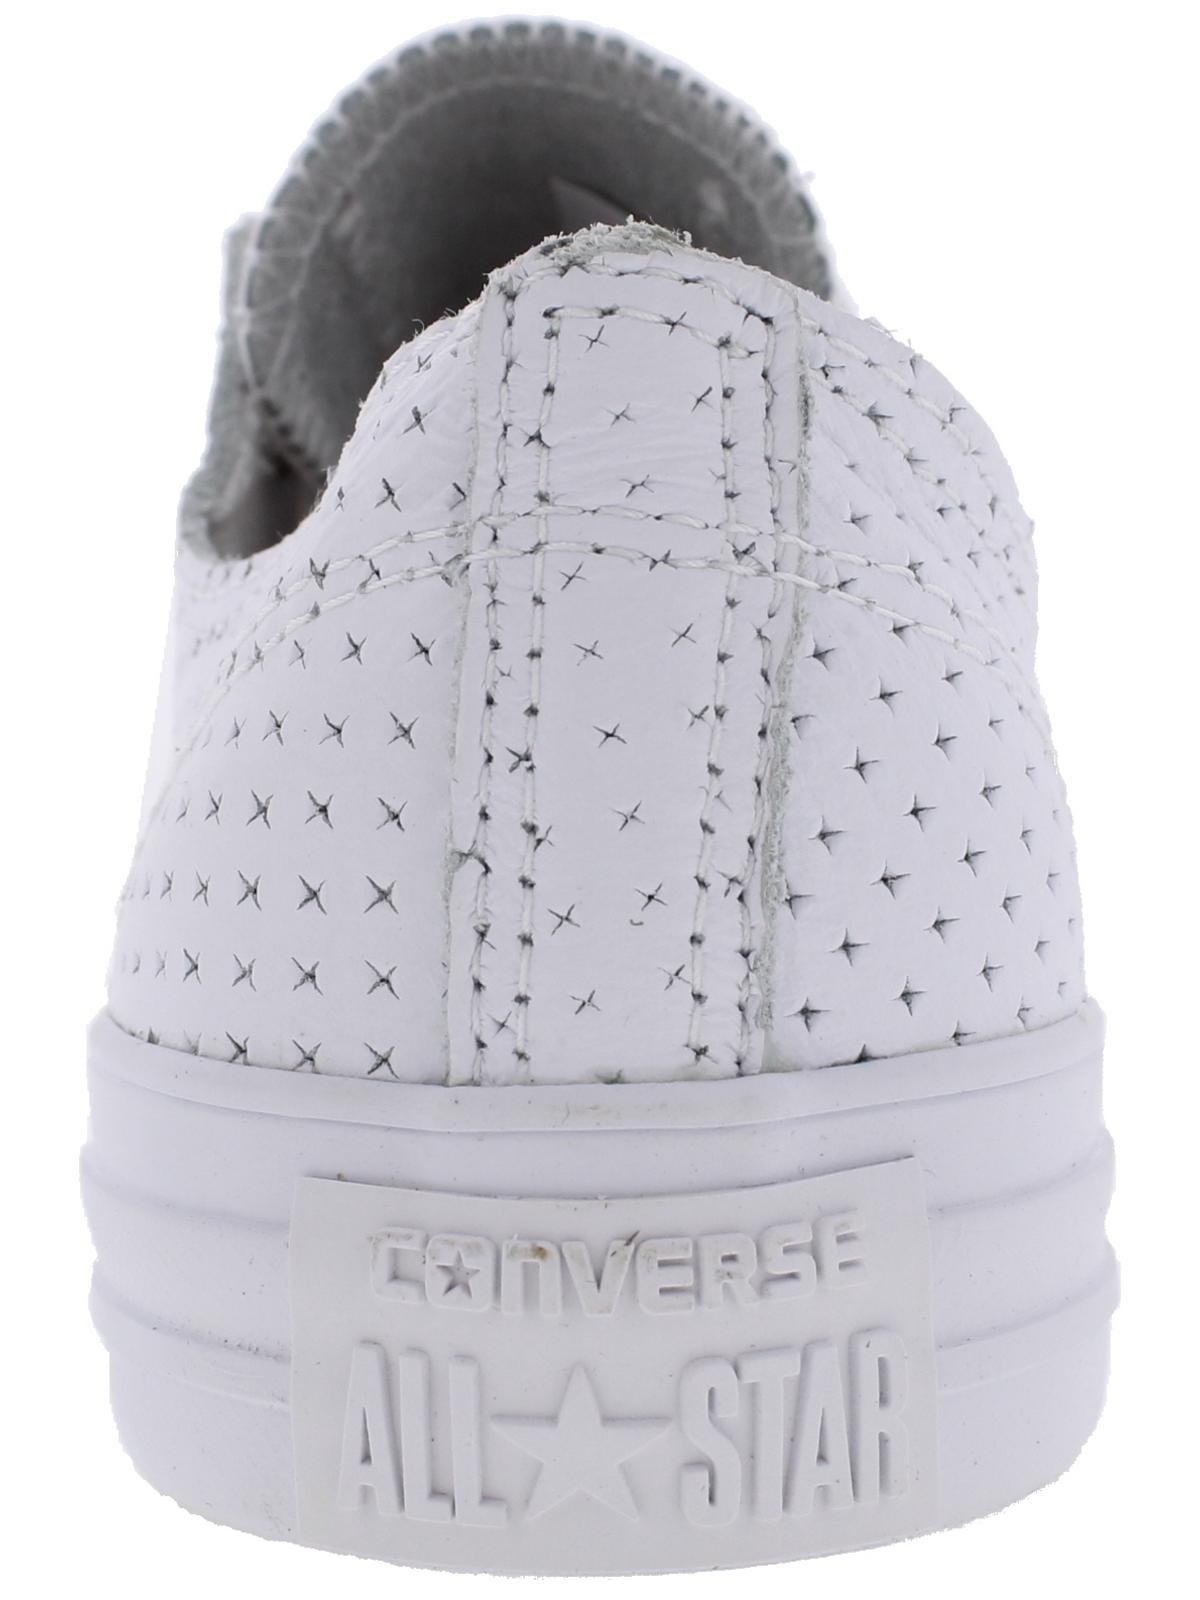 Converse M9697: Chuck Taylor All Star Low Top Ox Unisex Sneaker (14 D(M) US Men)